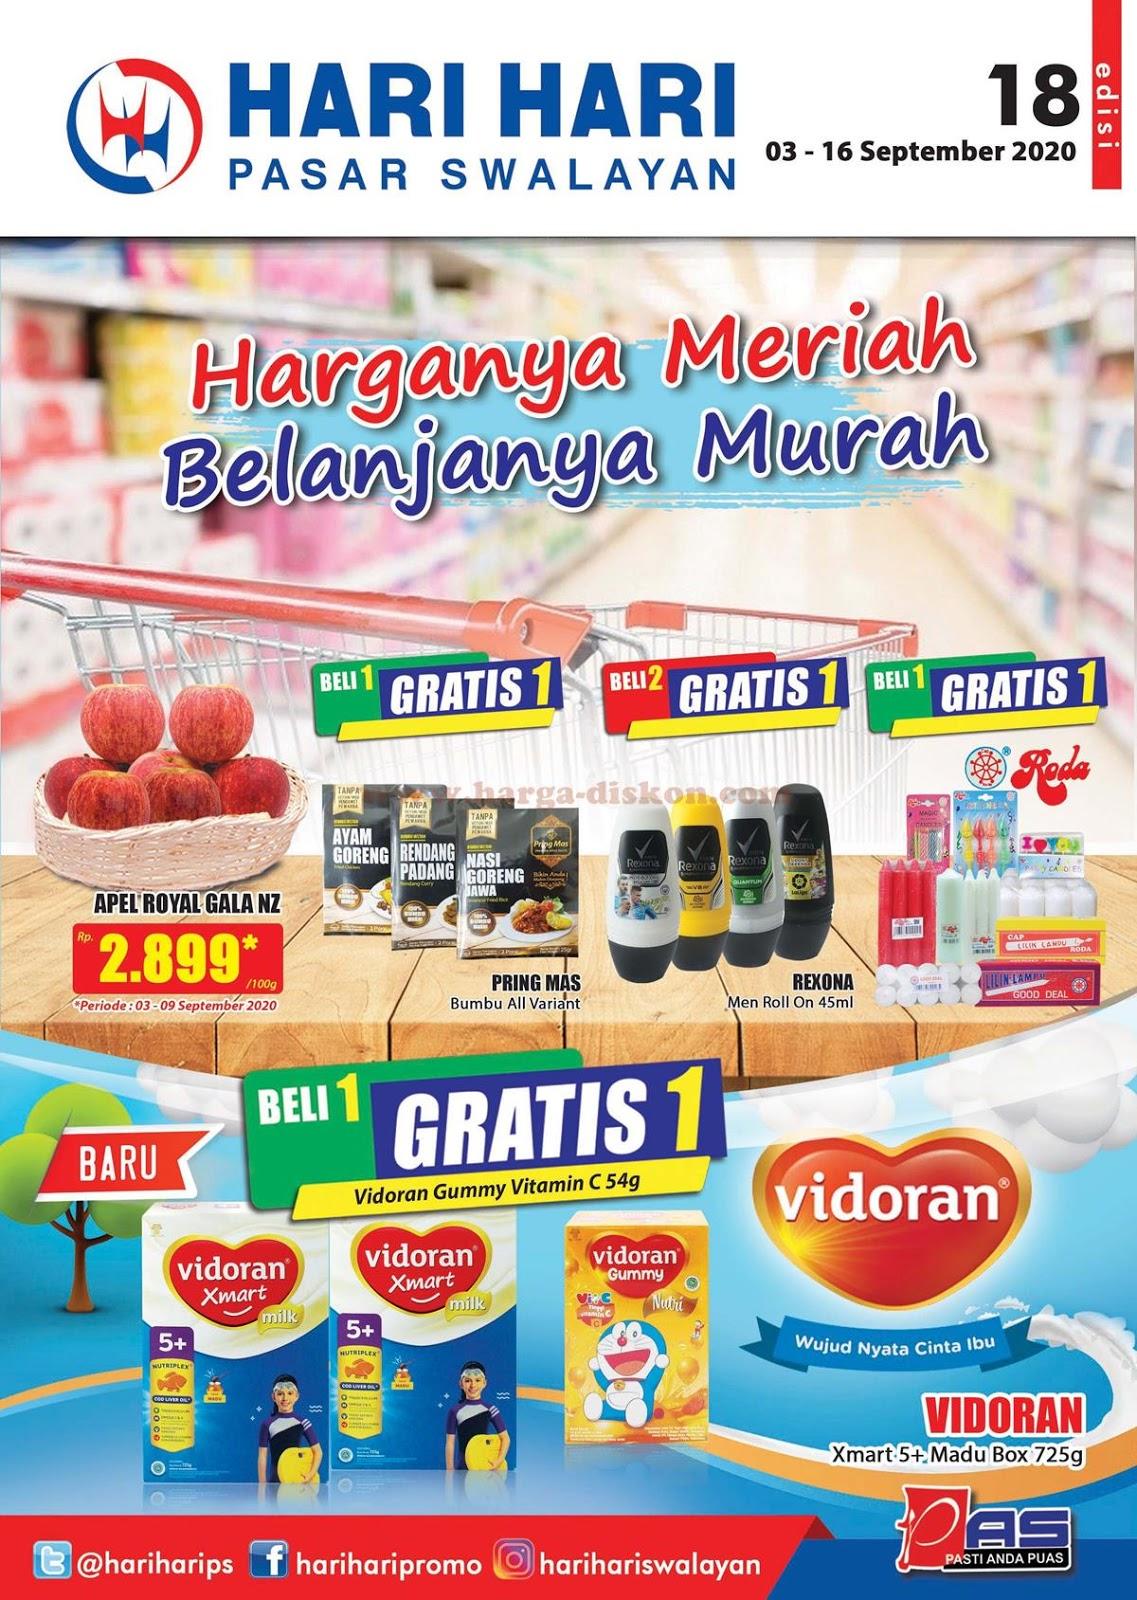 Katalog Promo Hari Hari Swalayan 03 16 September 2020 Harga Diskon